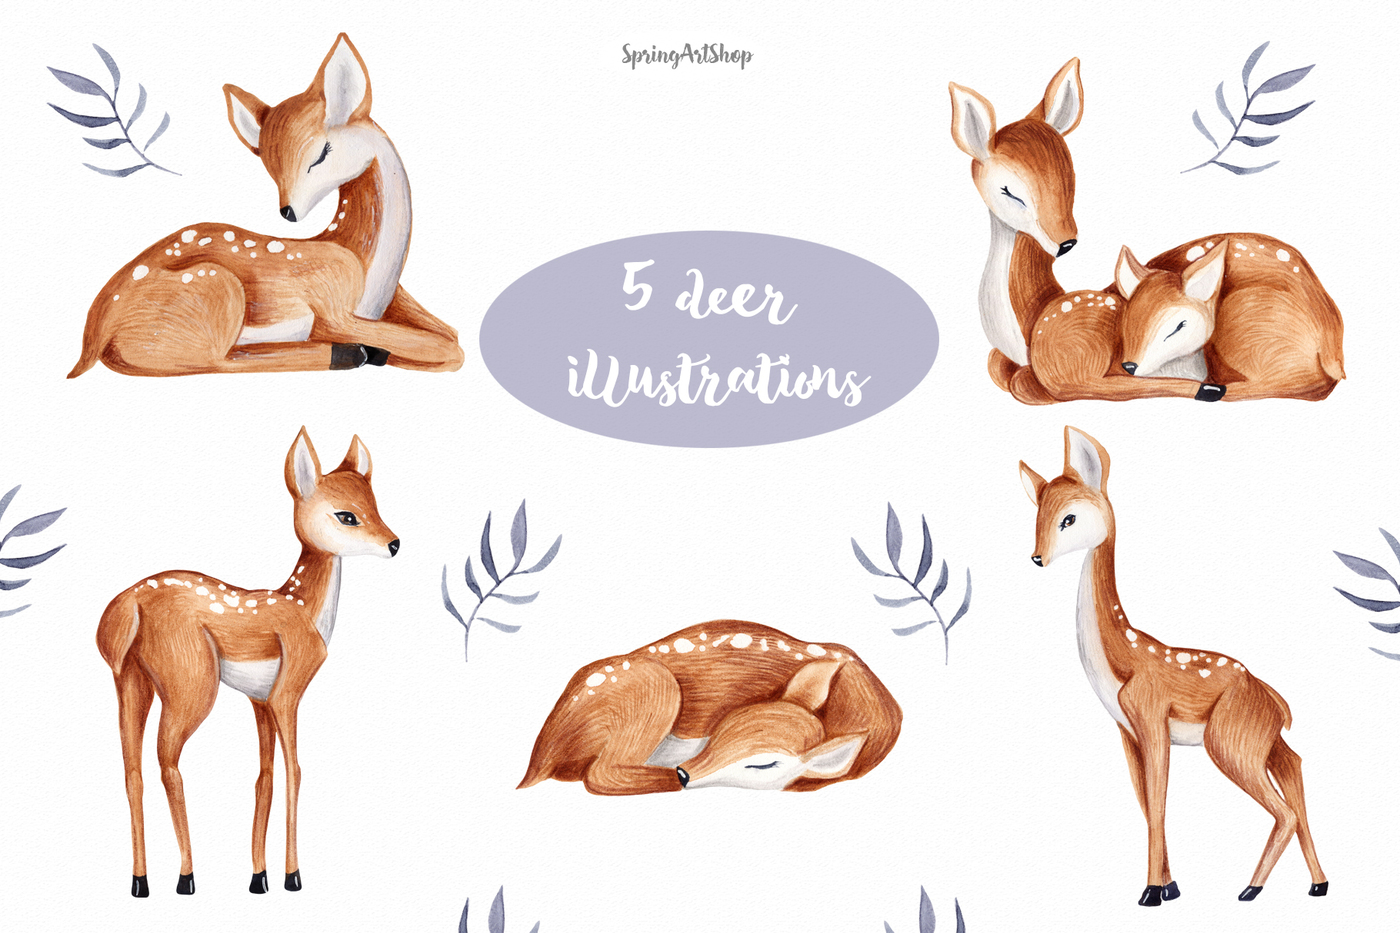 1400x933 Cute Baby Deer Watercolor Clipart By Springartshop